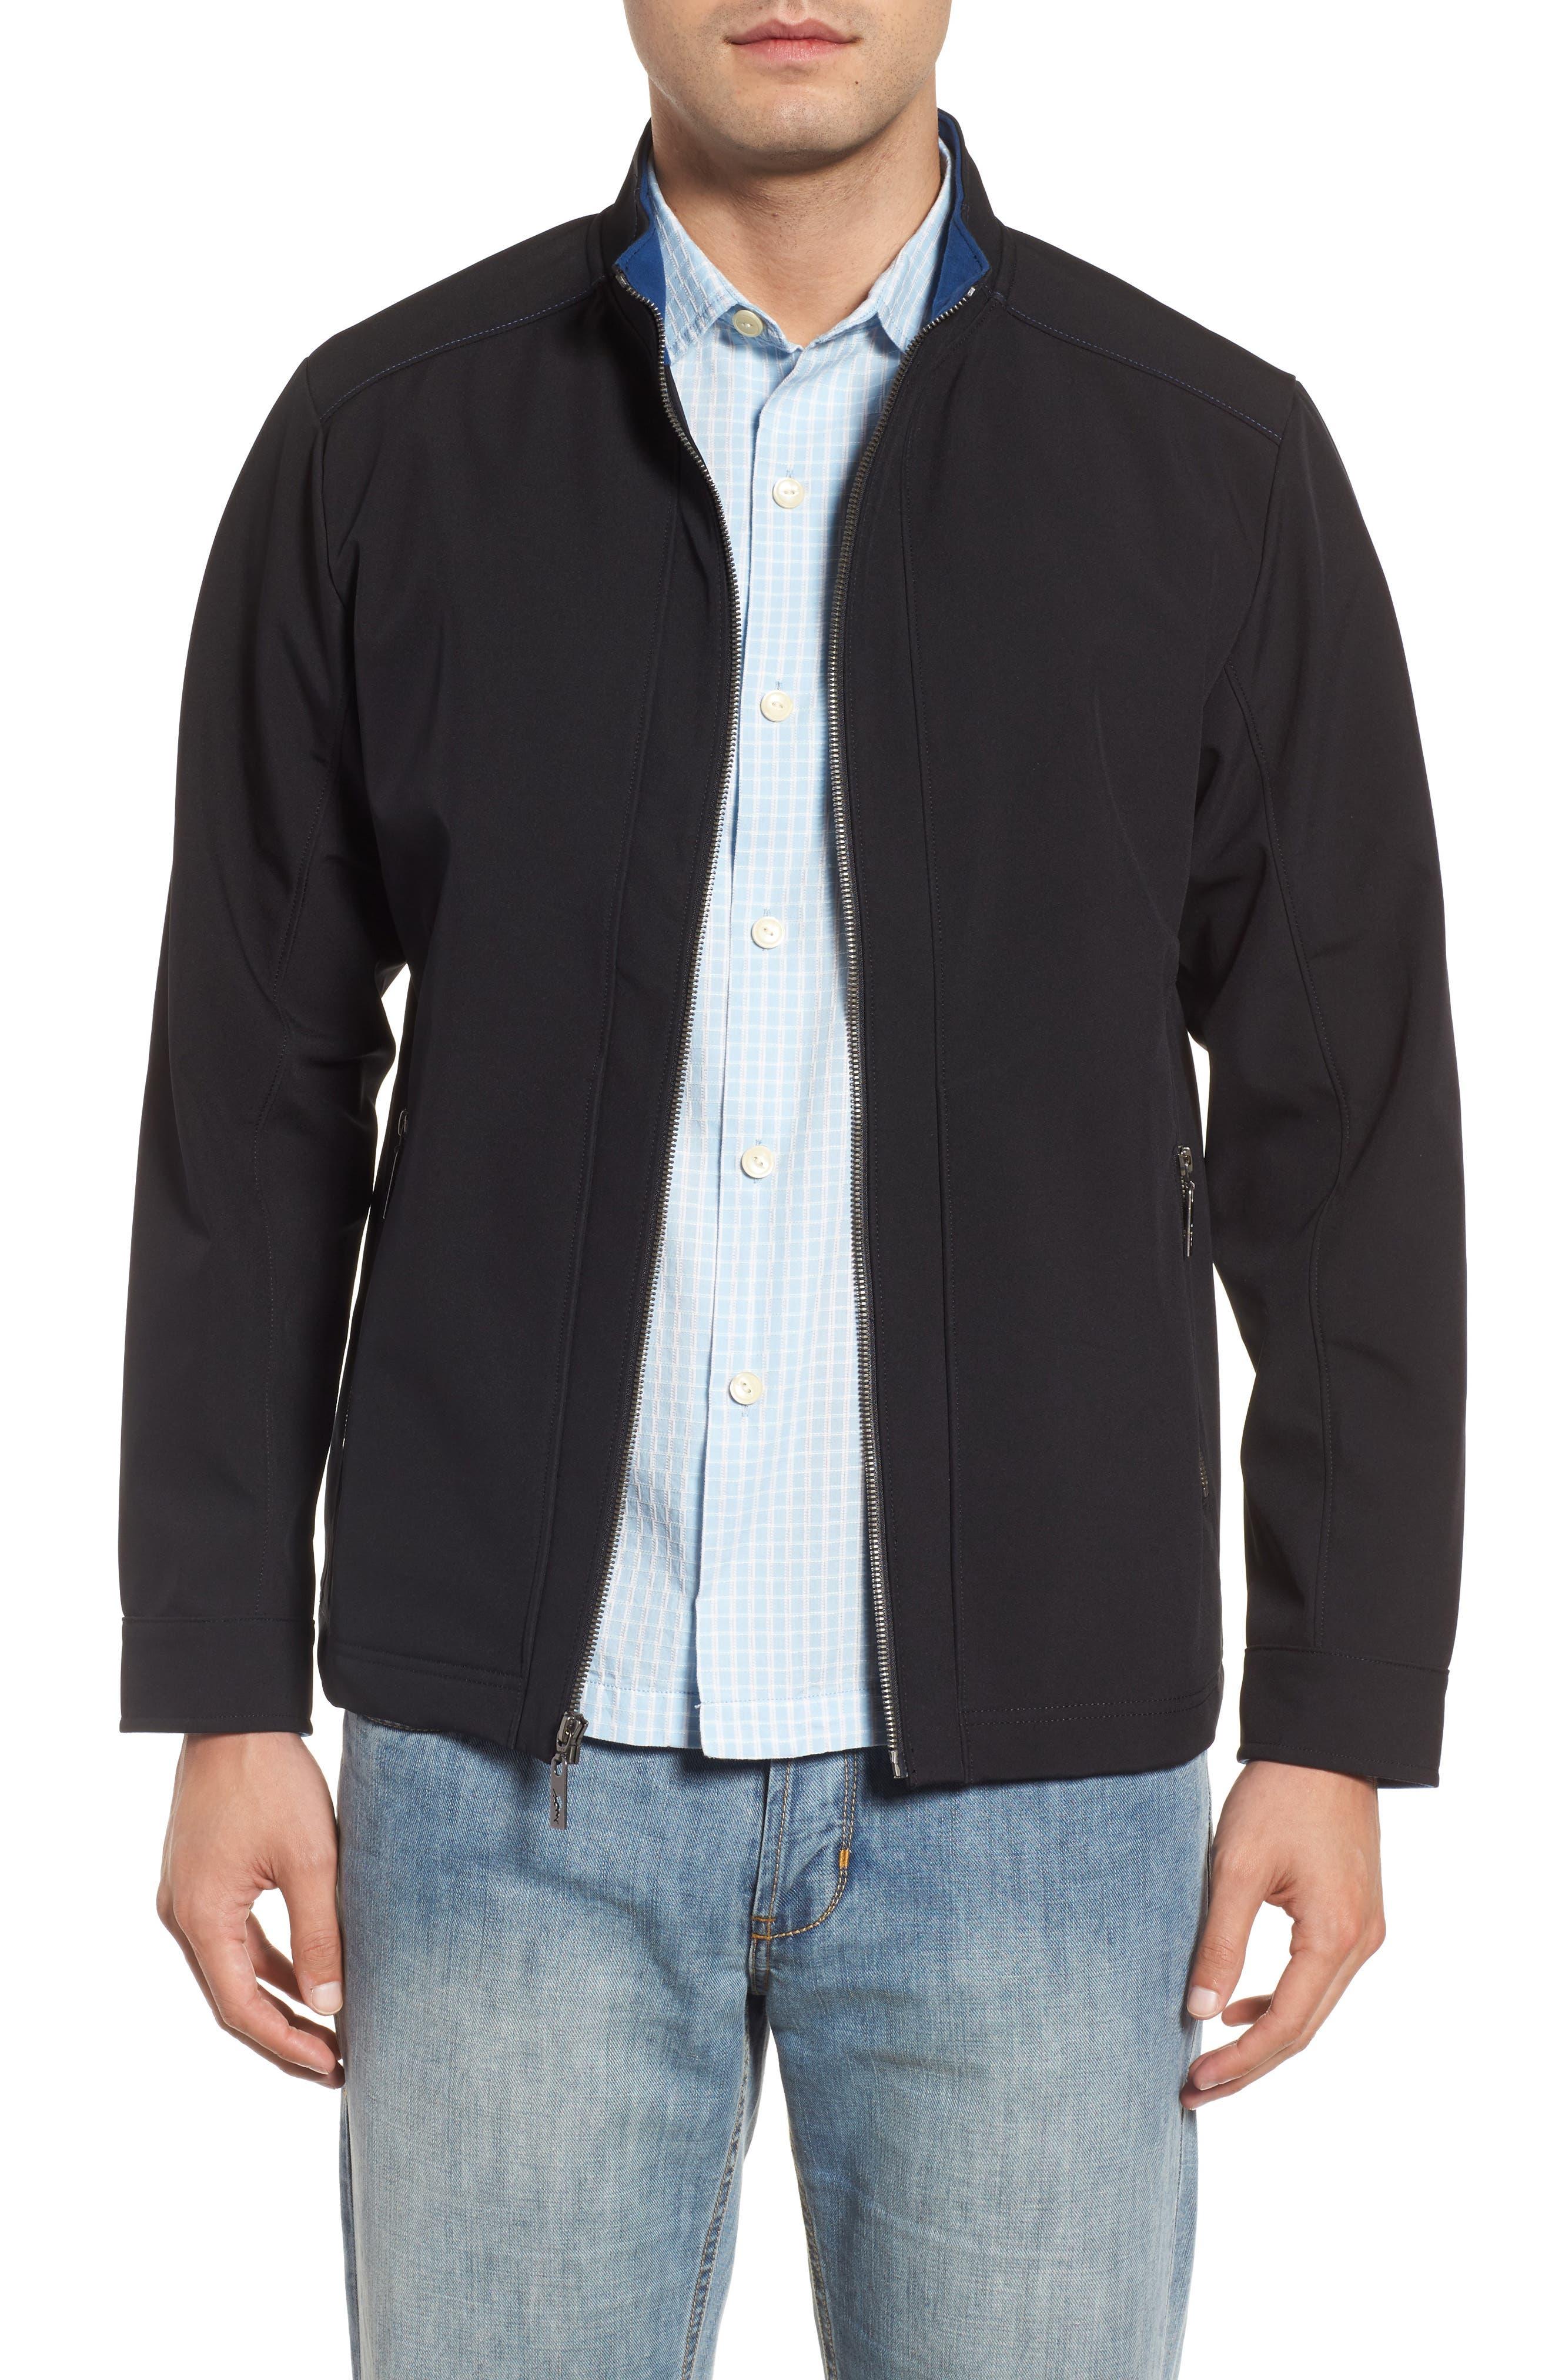 Downswing Zip Jacket,                         Main,                         color, Black